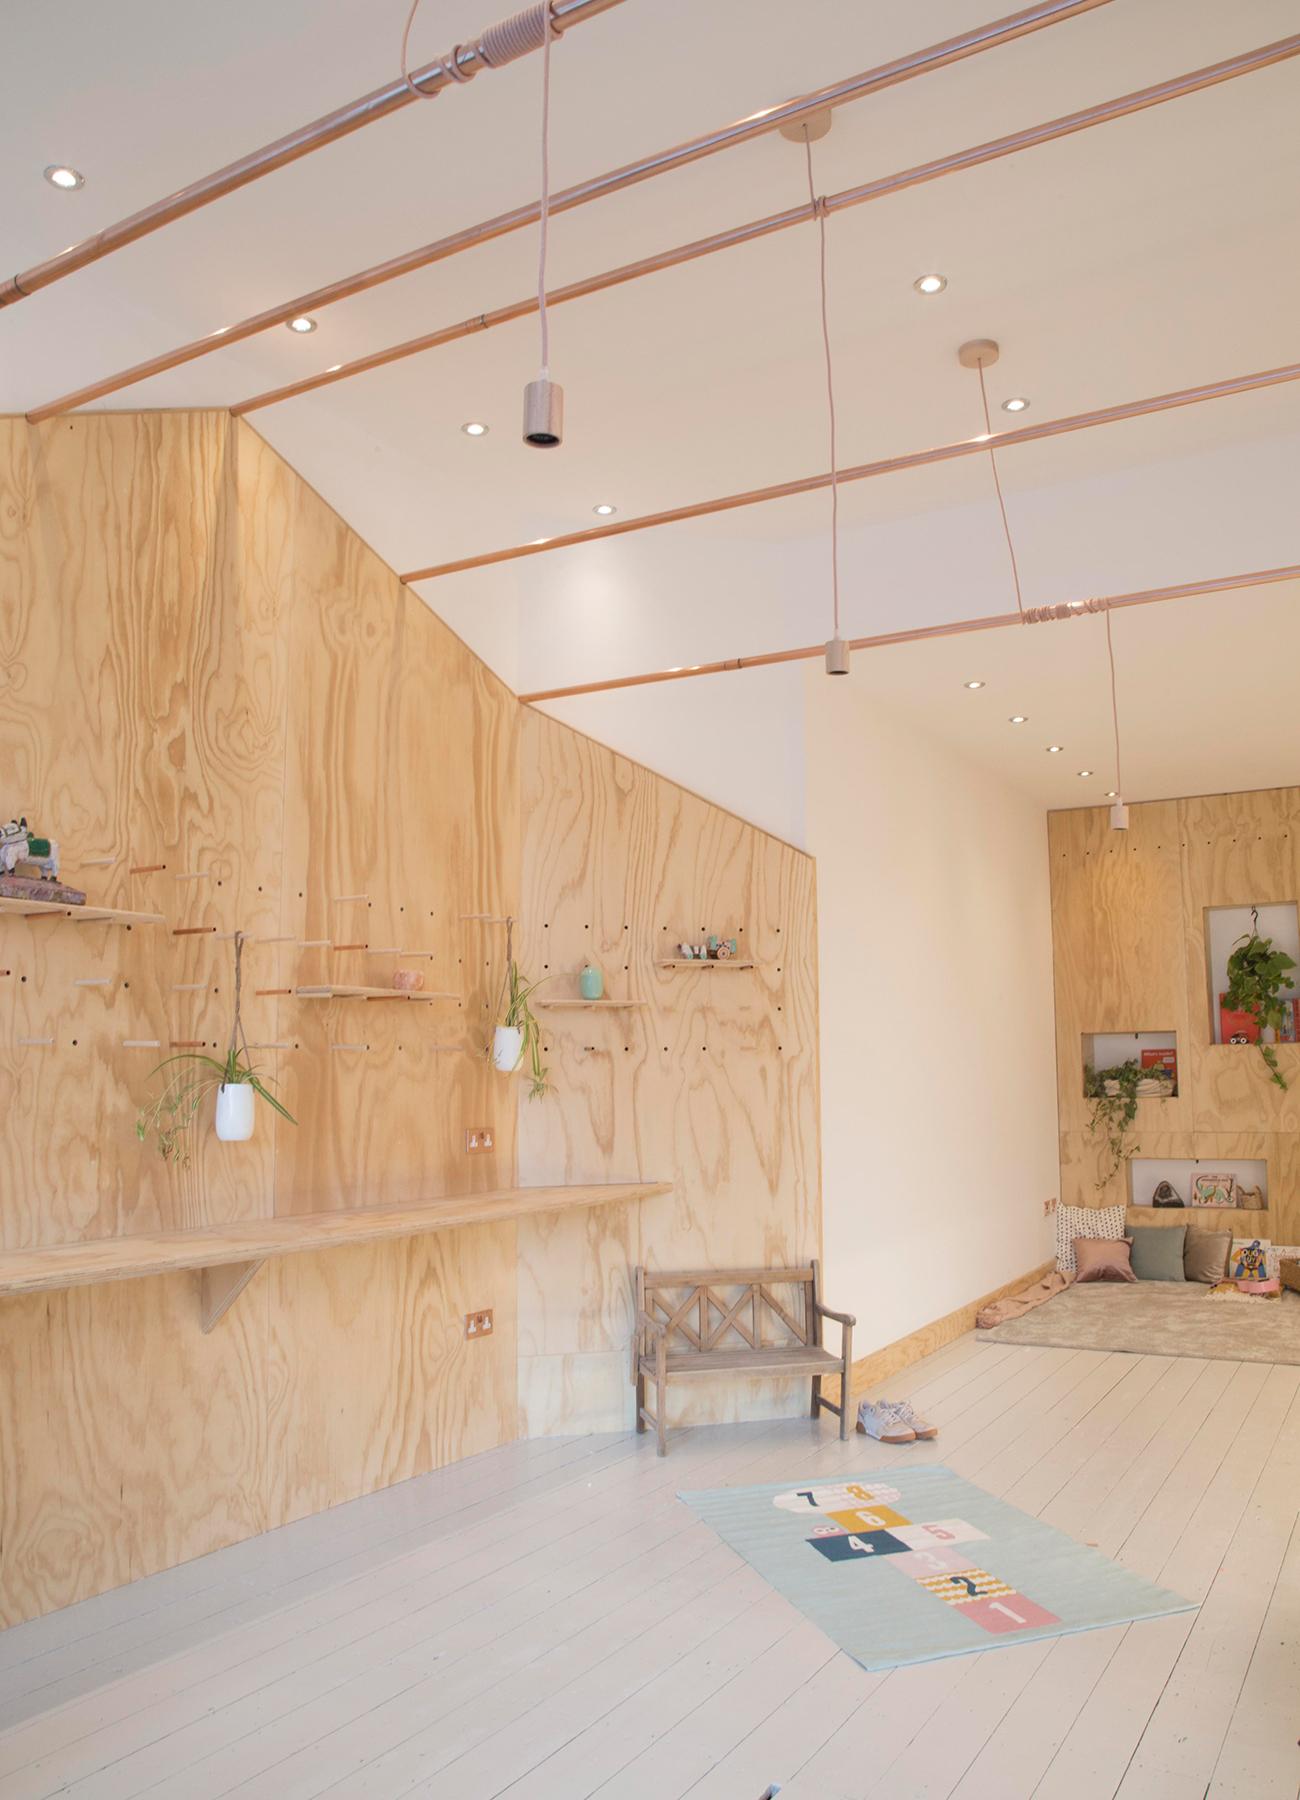 TT_Holistic-Education-Studio-26.jpg